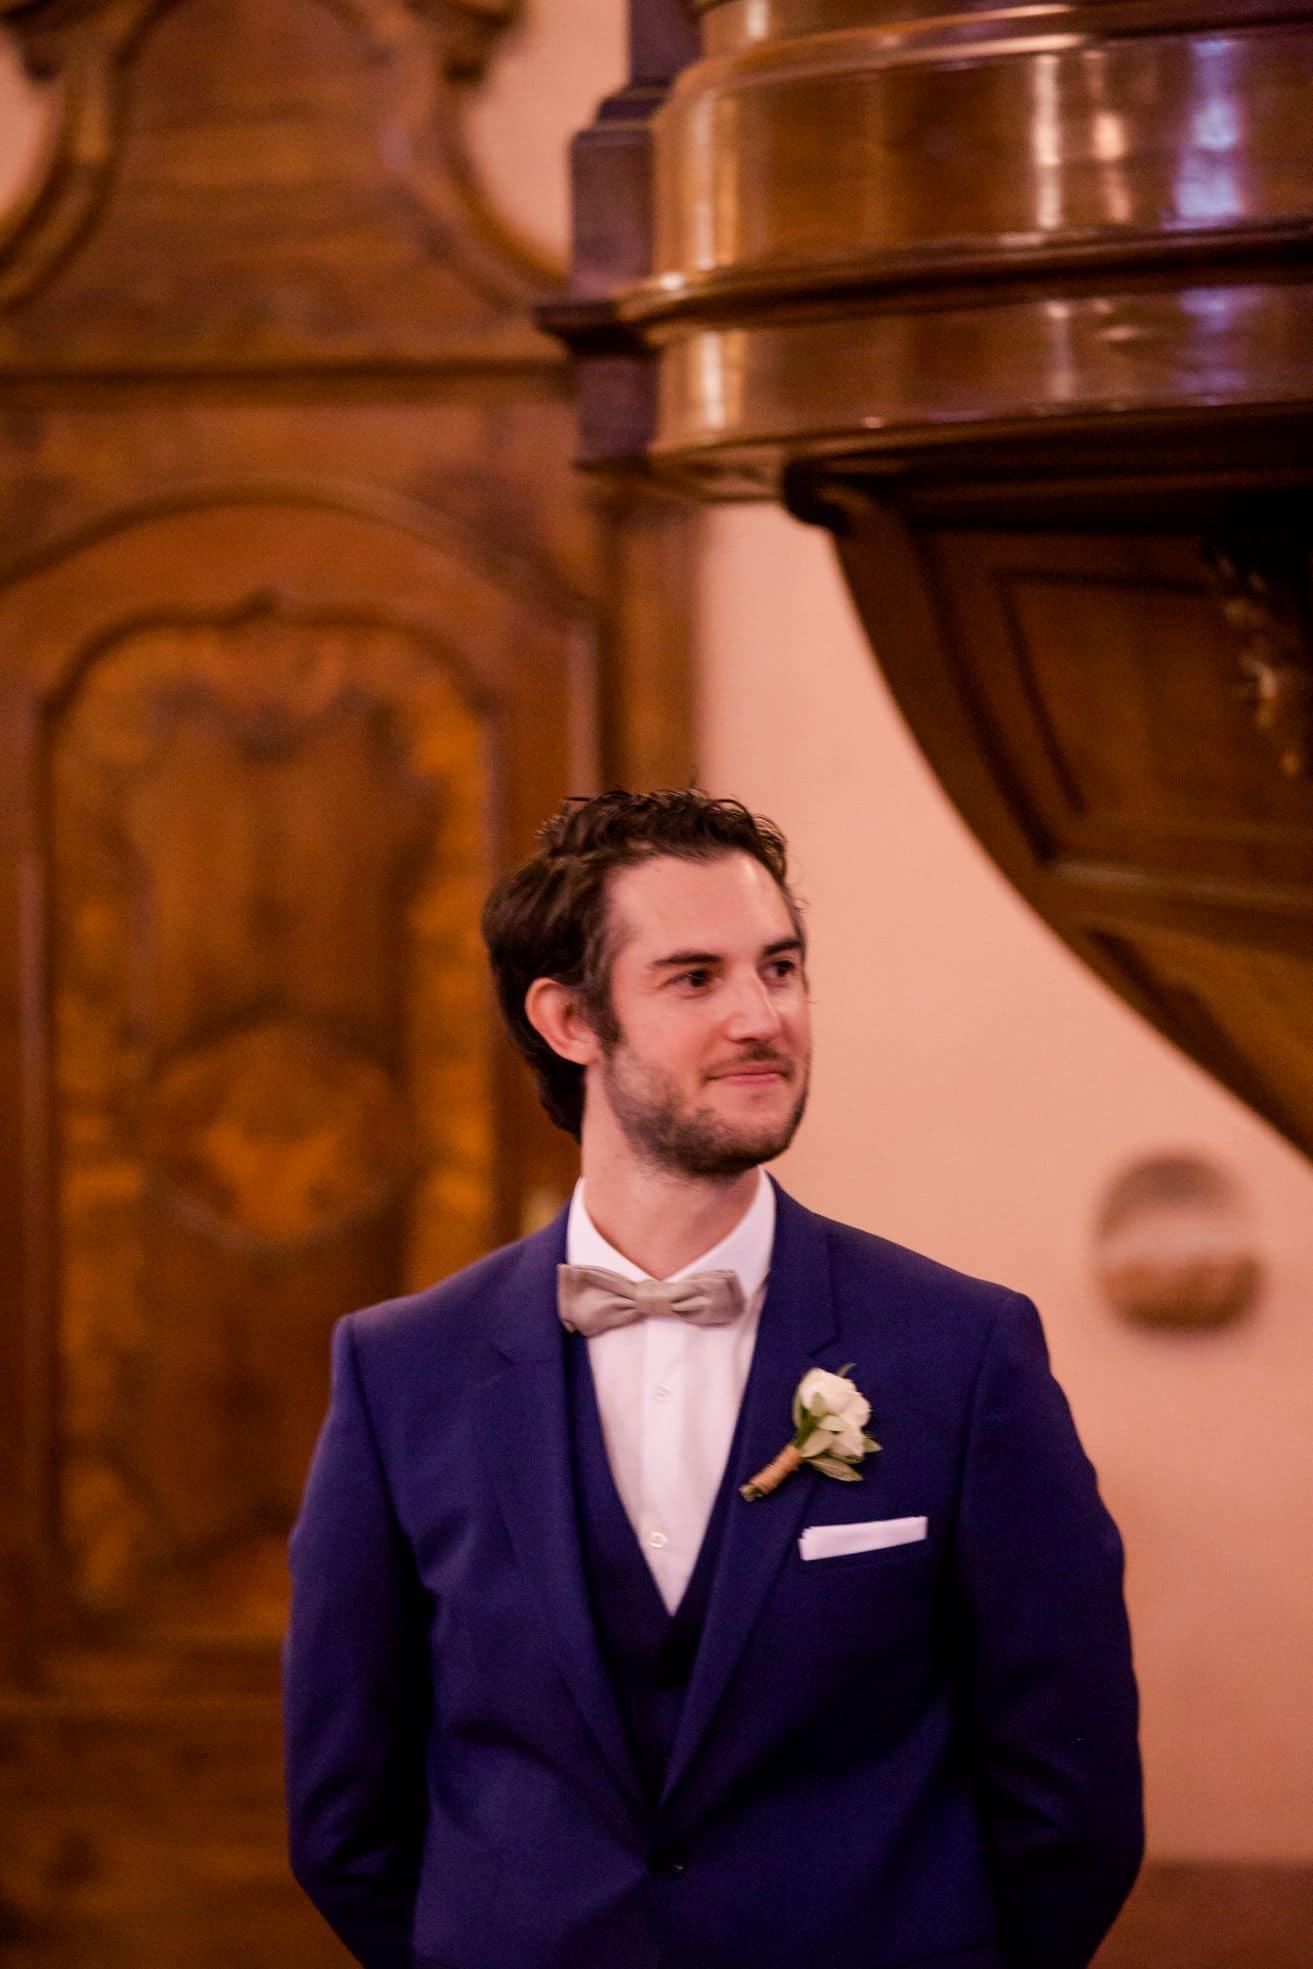 Million Memories_A&D_Hochzeitsfotograf_Schlosshochzeit_Toskana_Lago Di Como_Wedding_Tuscany_086